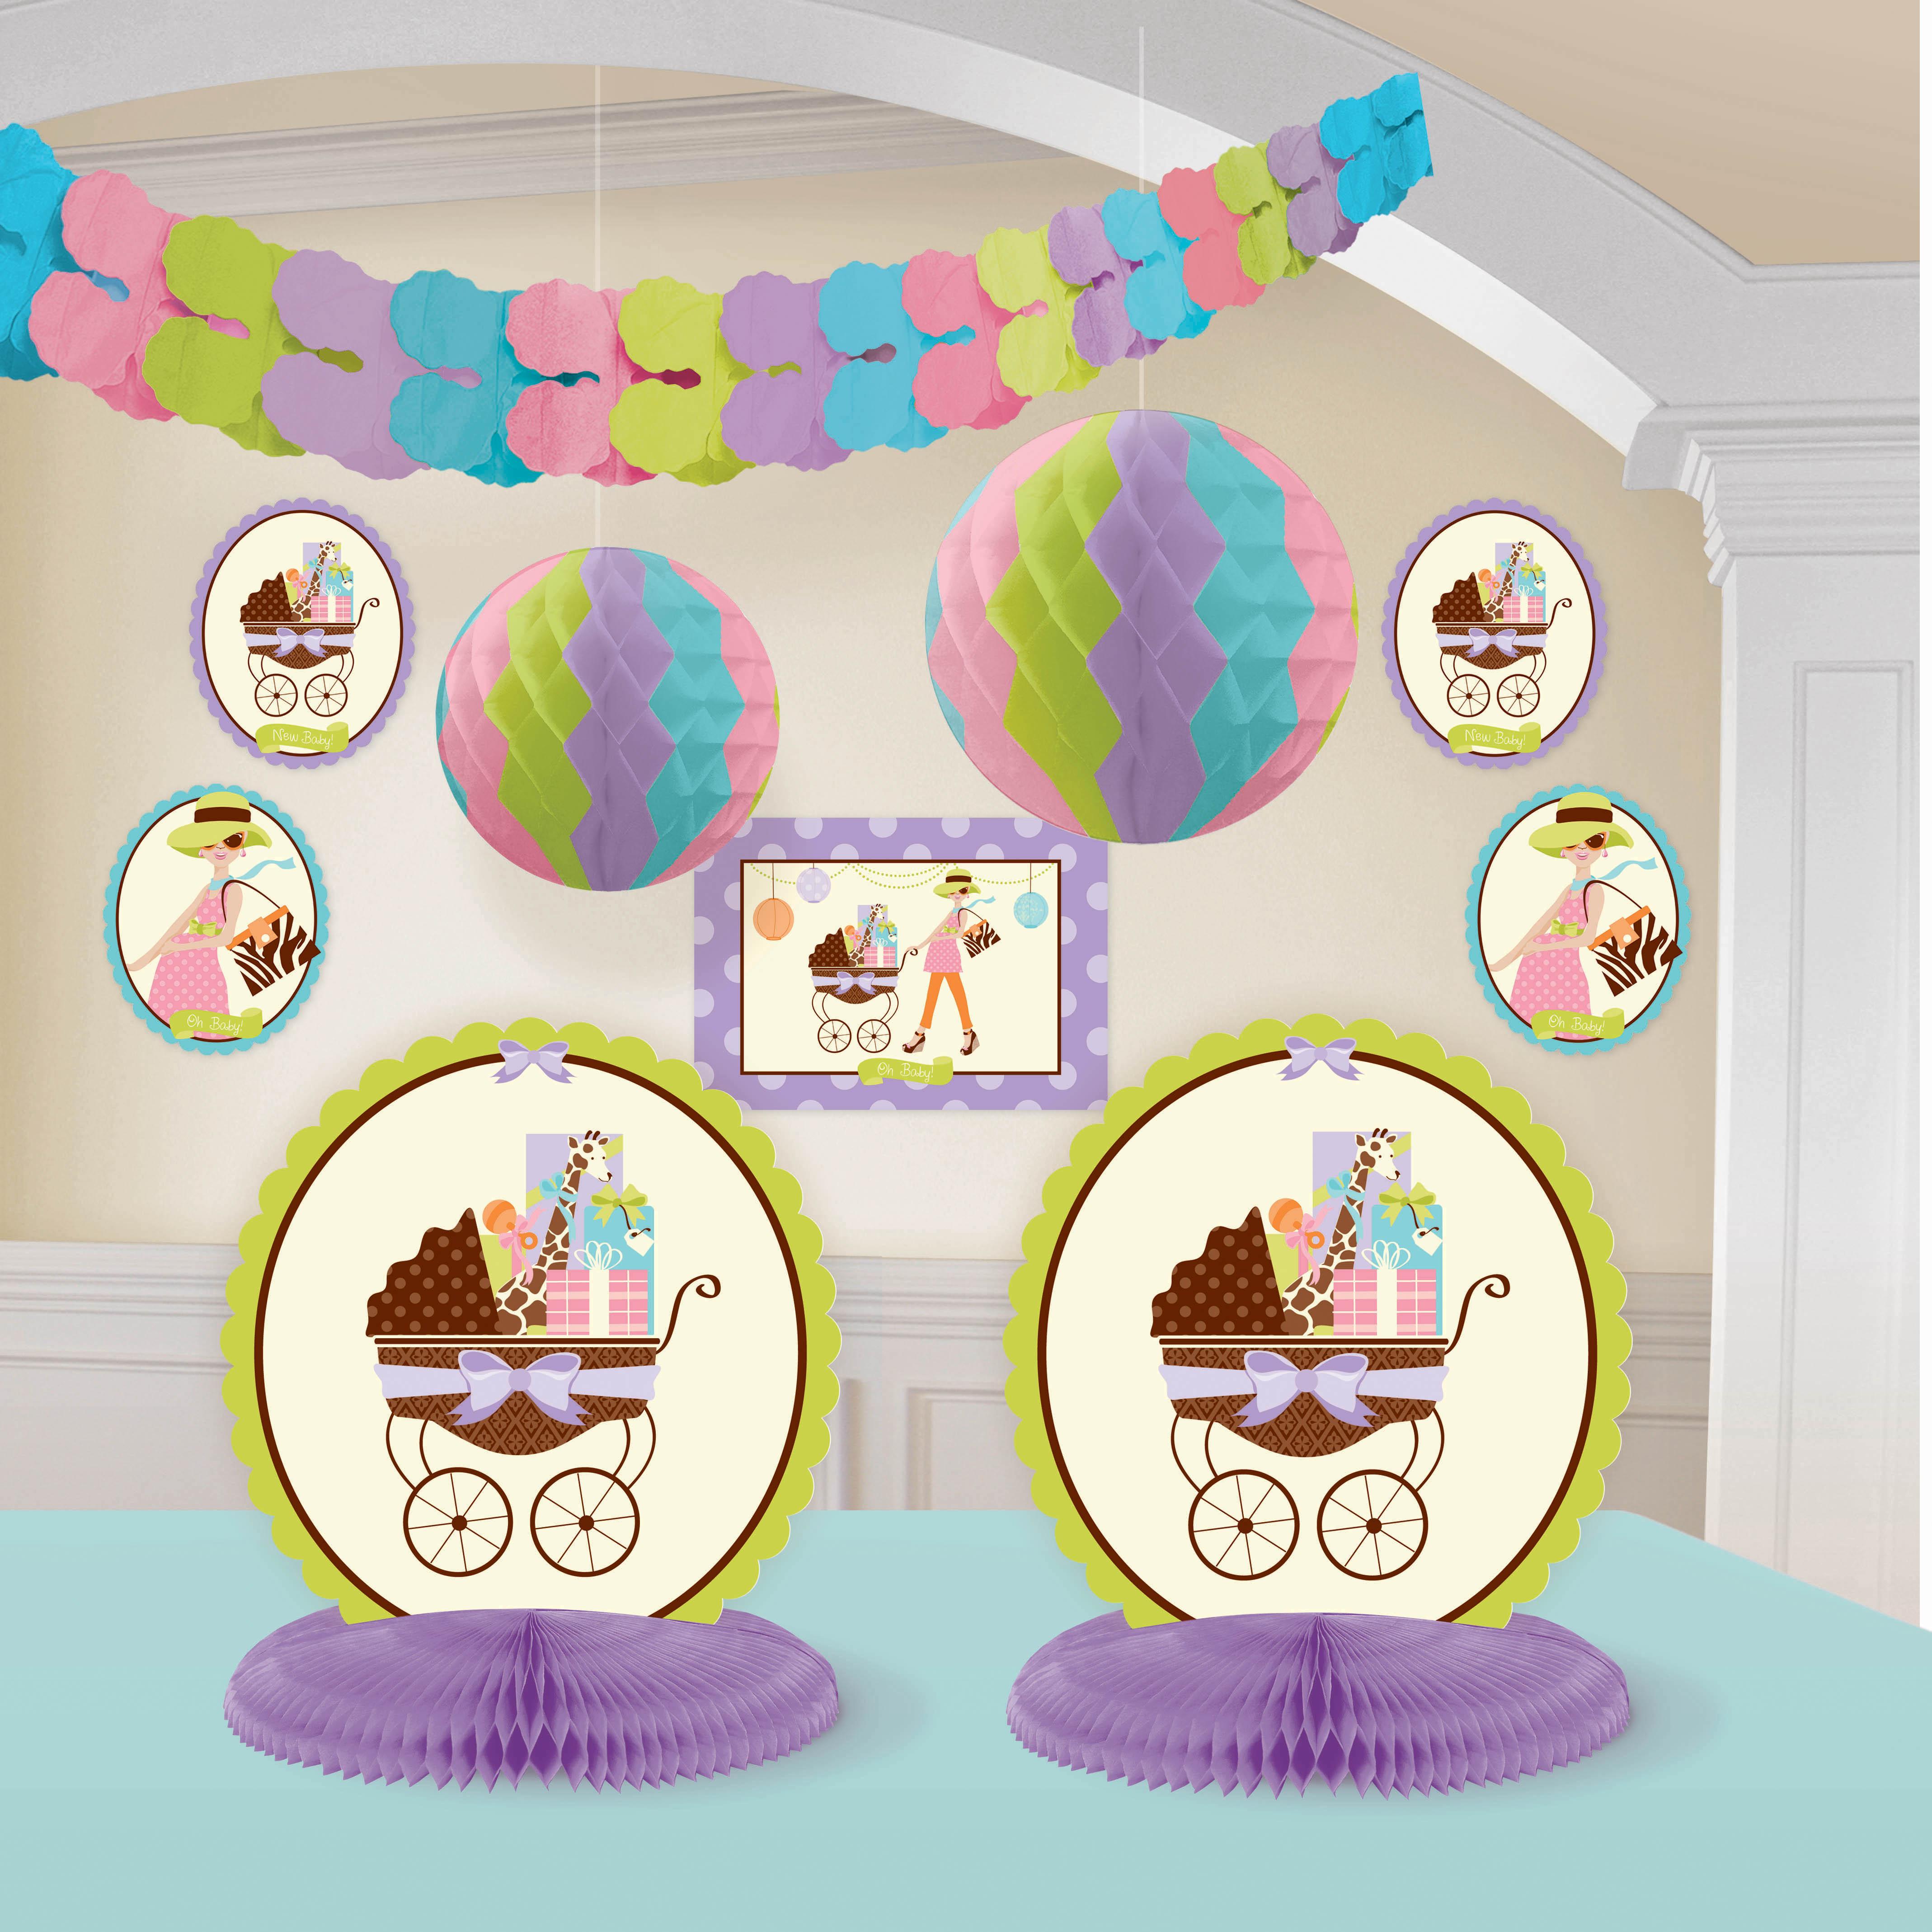 Leopard Print Baby Shower Supplies: Modern Mommy Room Decorating Kit Baby Shower Giraffe